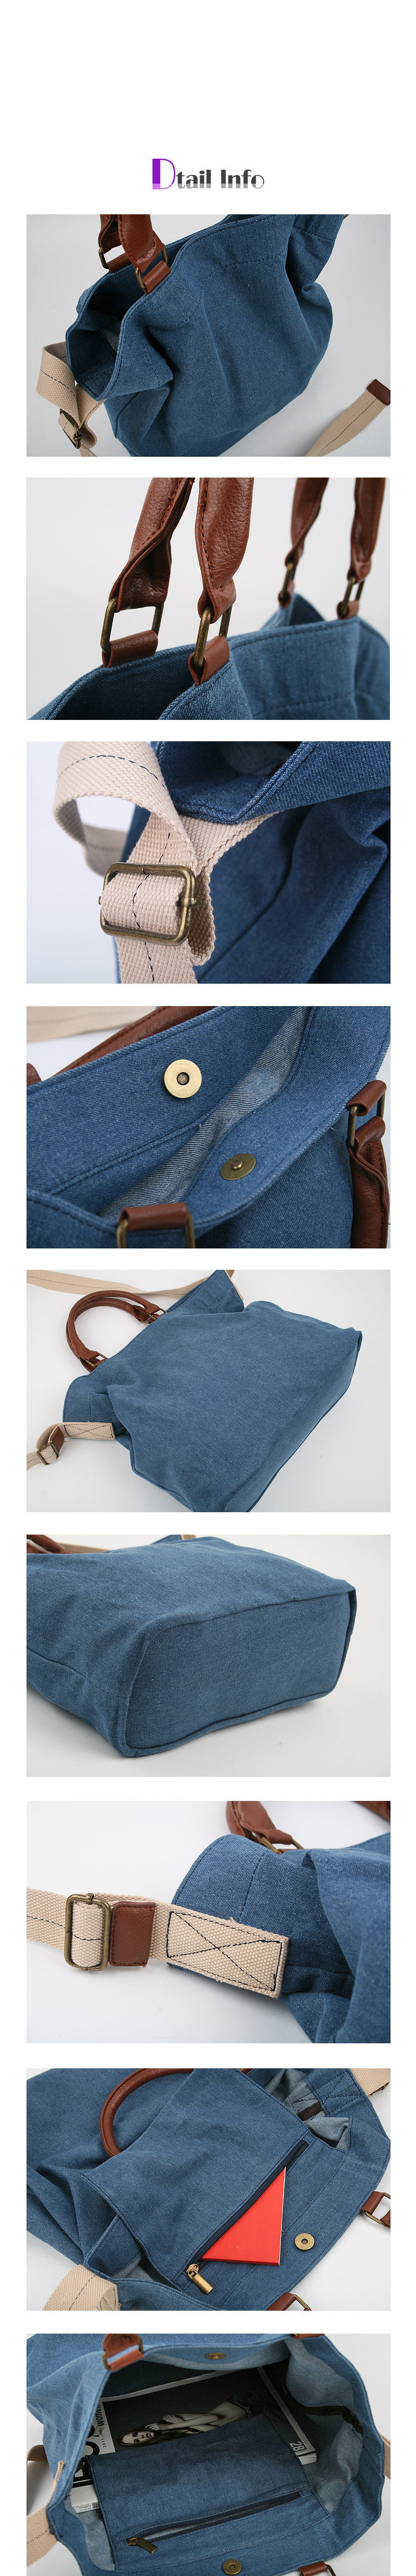 Shoulder&tote bag no.K50211view-1